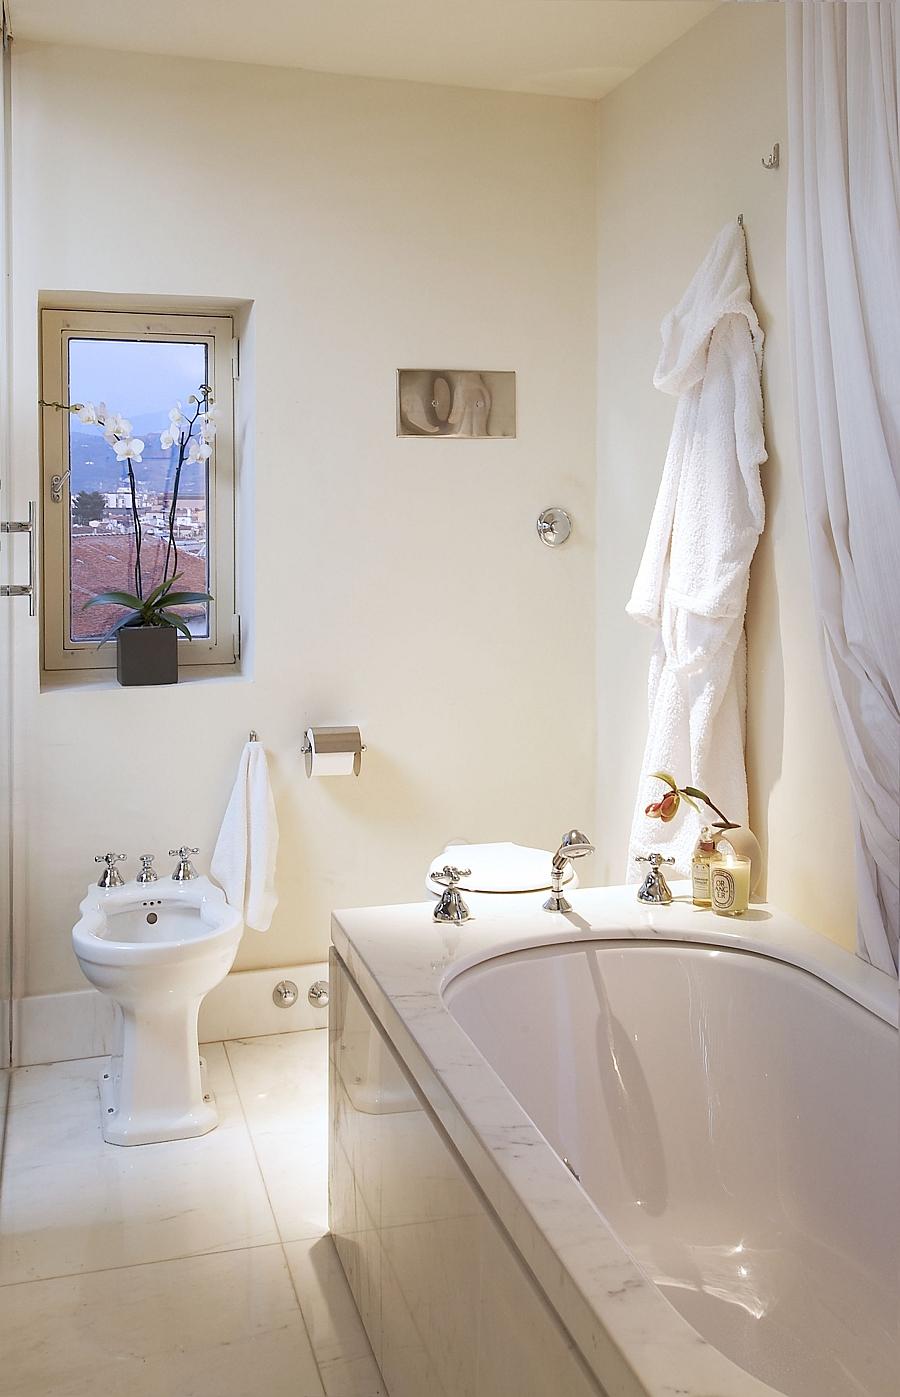 Lavish bathroom has an organic and serene appeal